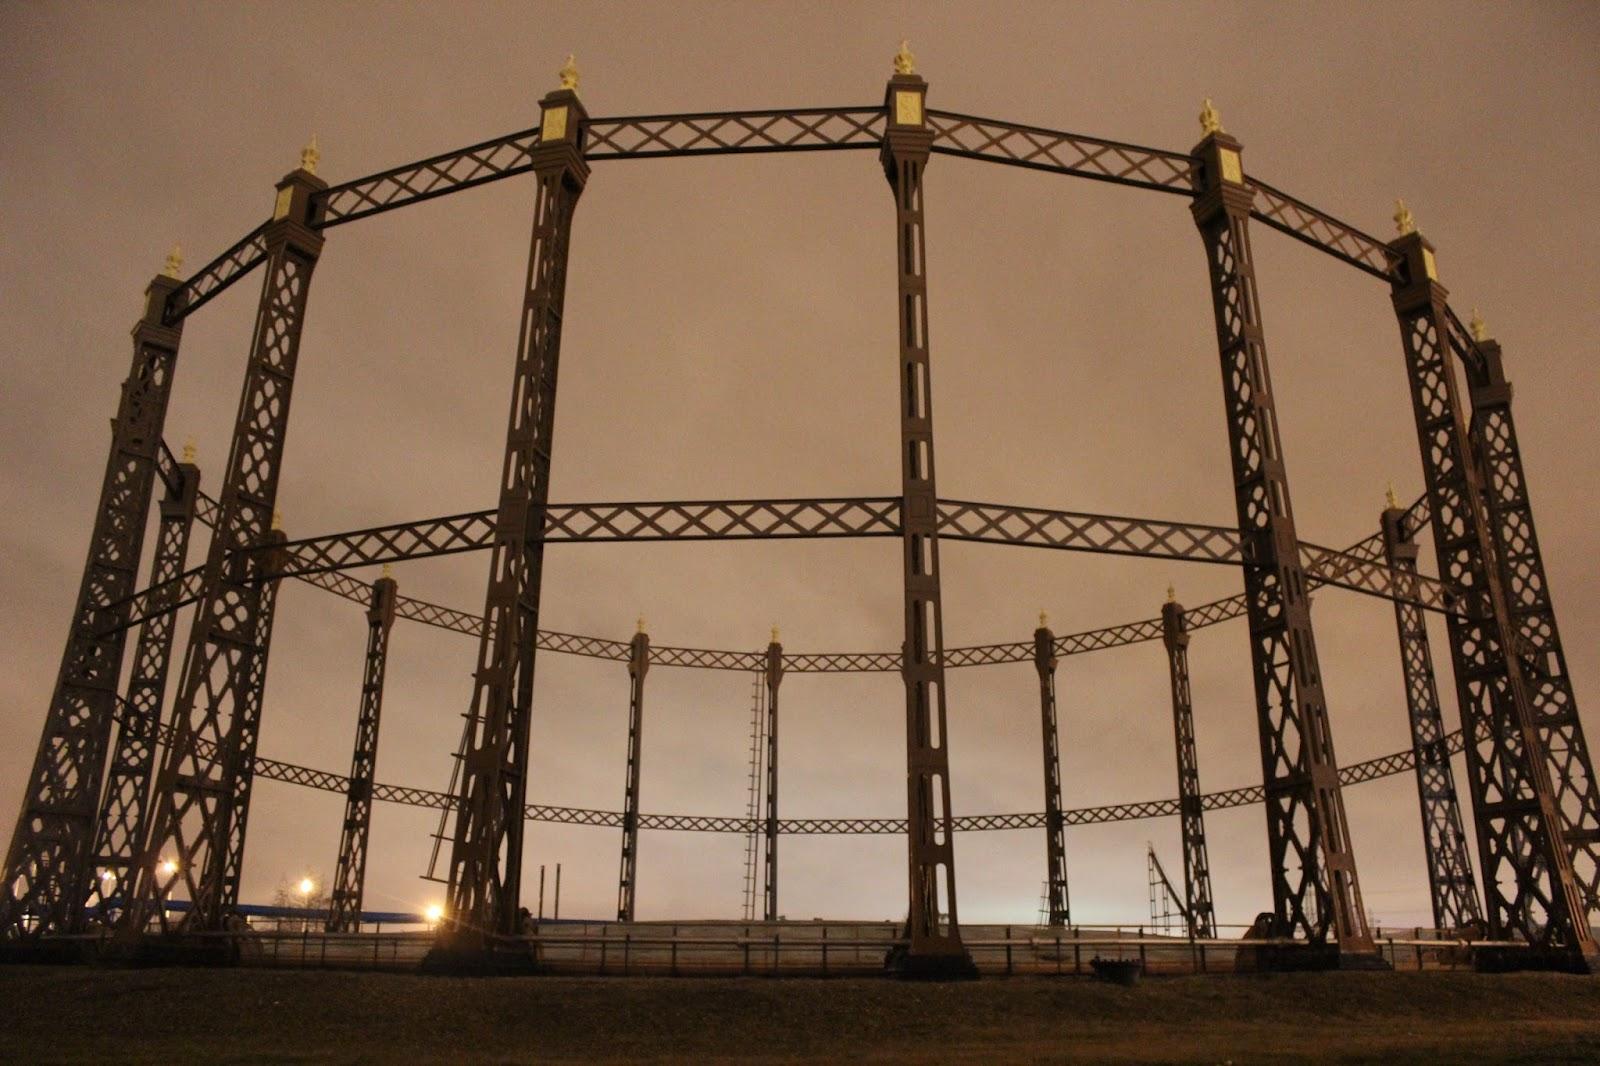 Beckton Gas Holder, London   The Urban Adventures of Keïteï